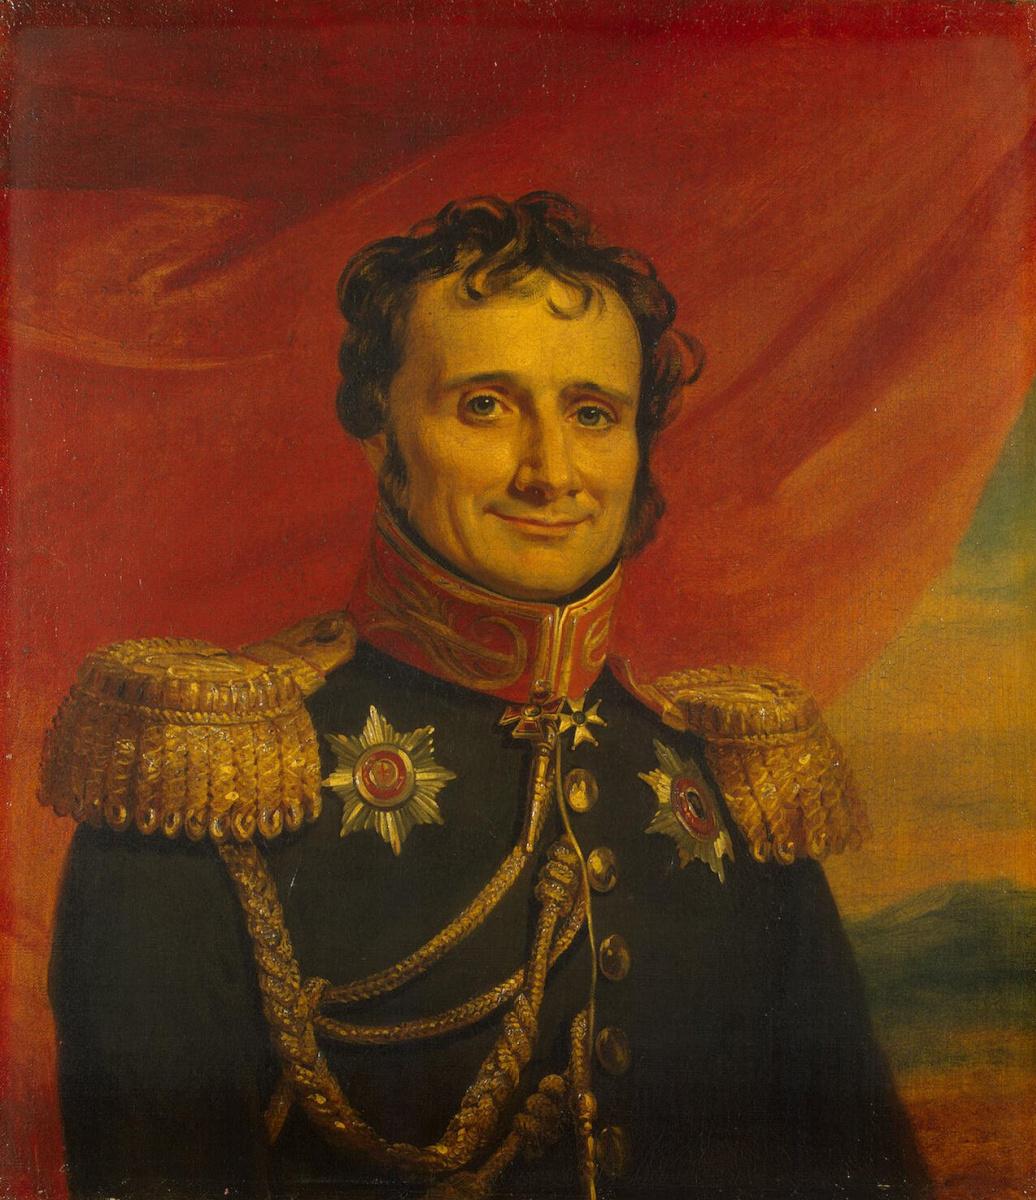 Джордж Доу. Портрет Генриха Вениаминовича Жомини